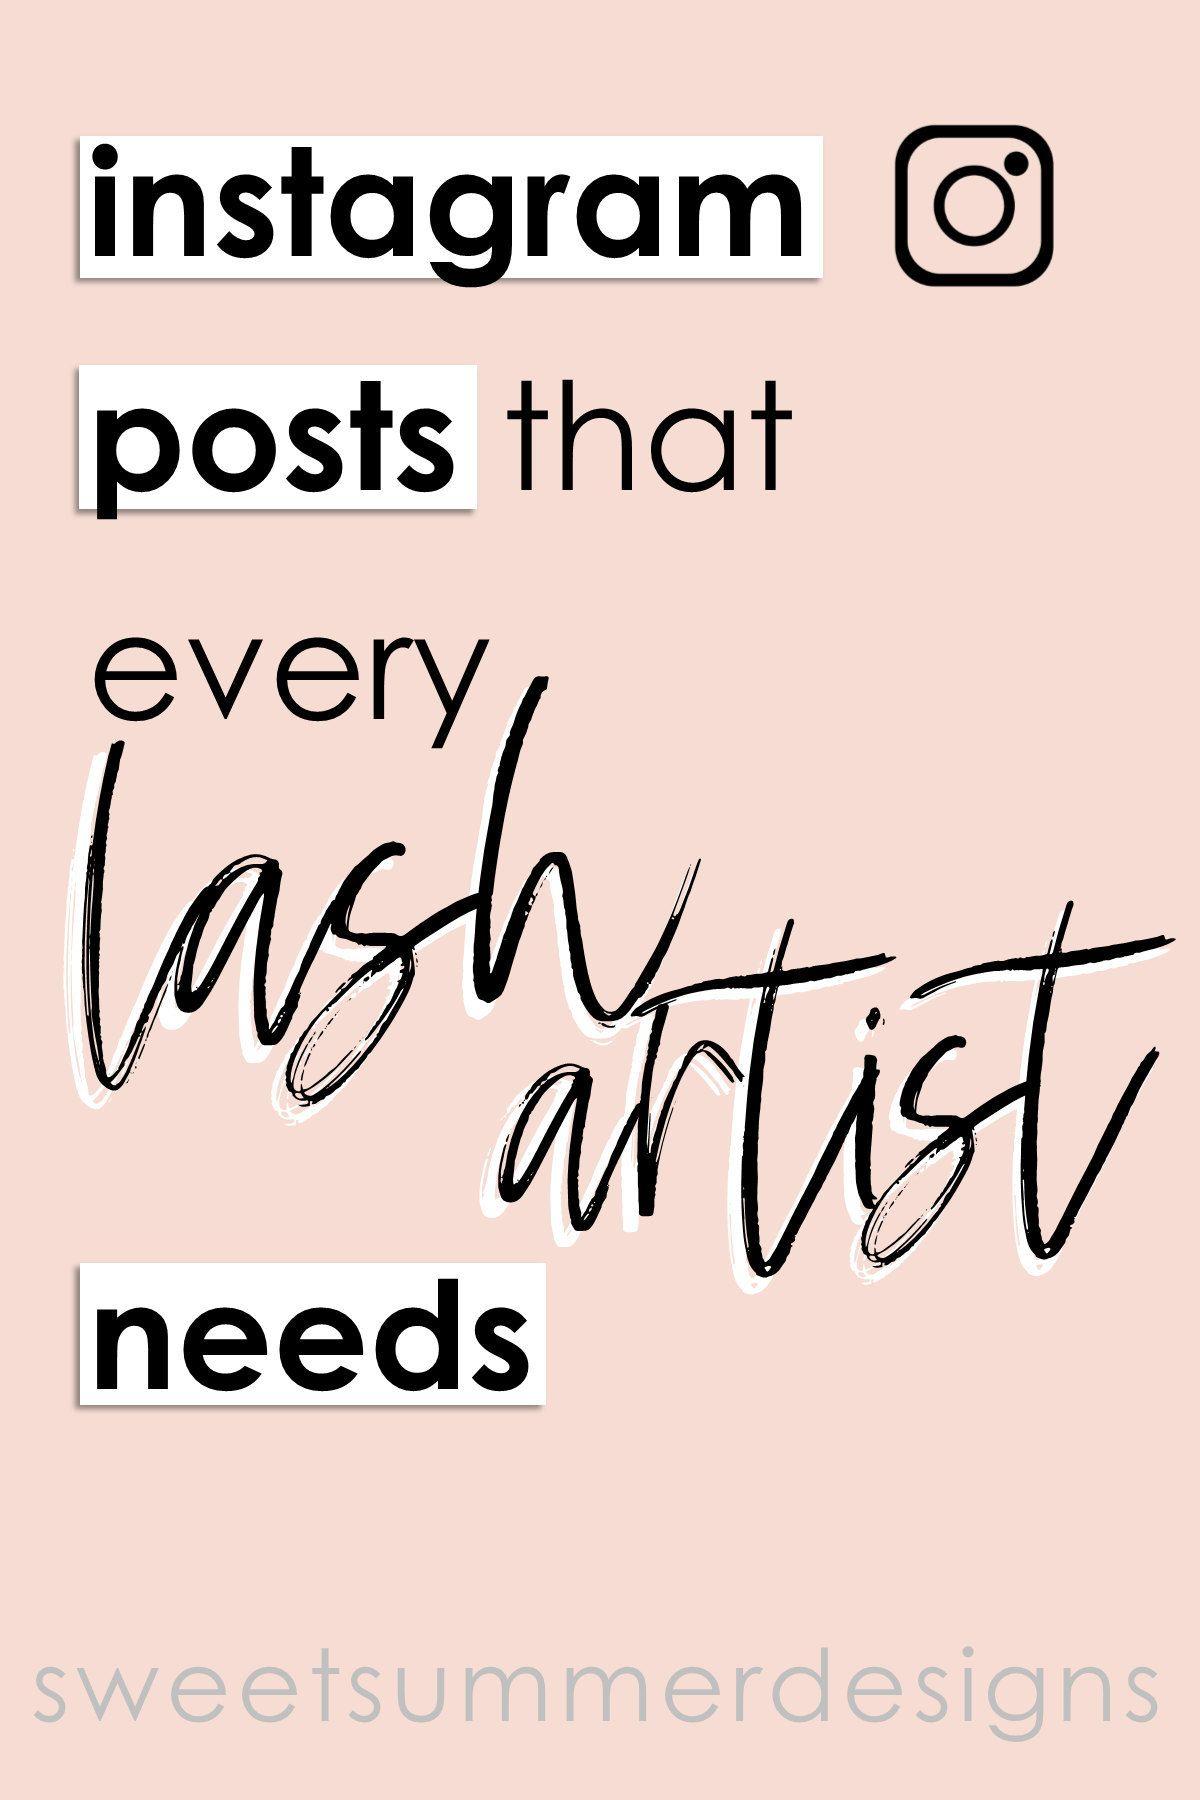 40 Lash Artist Black and Rose Gold Instagram Posts, Lash